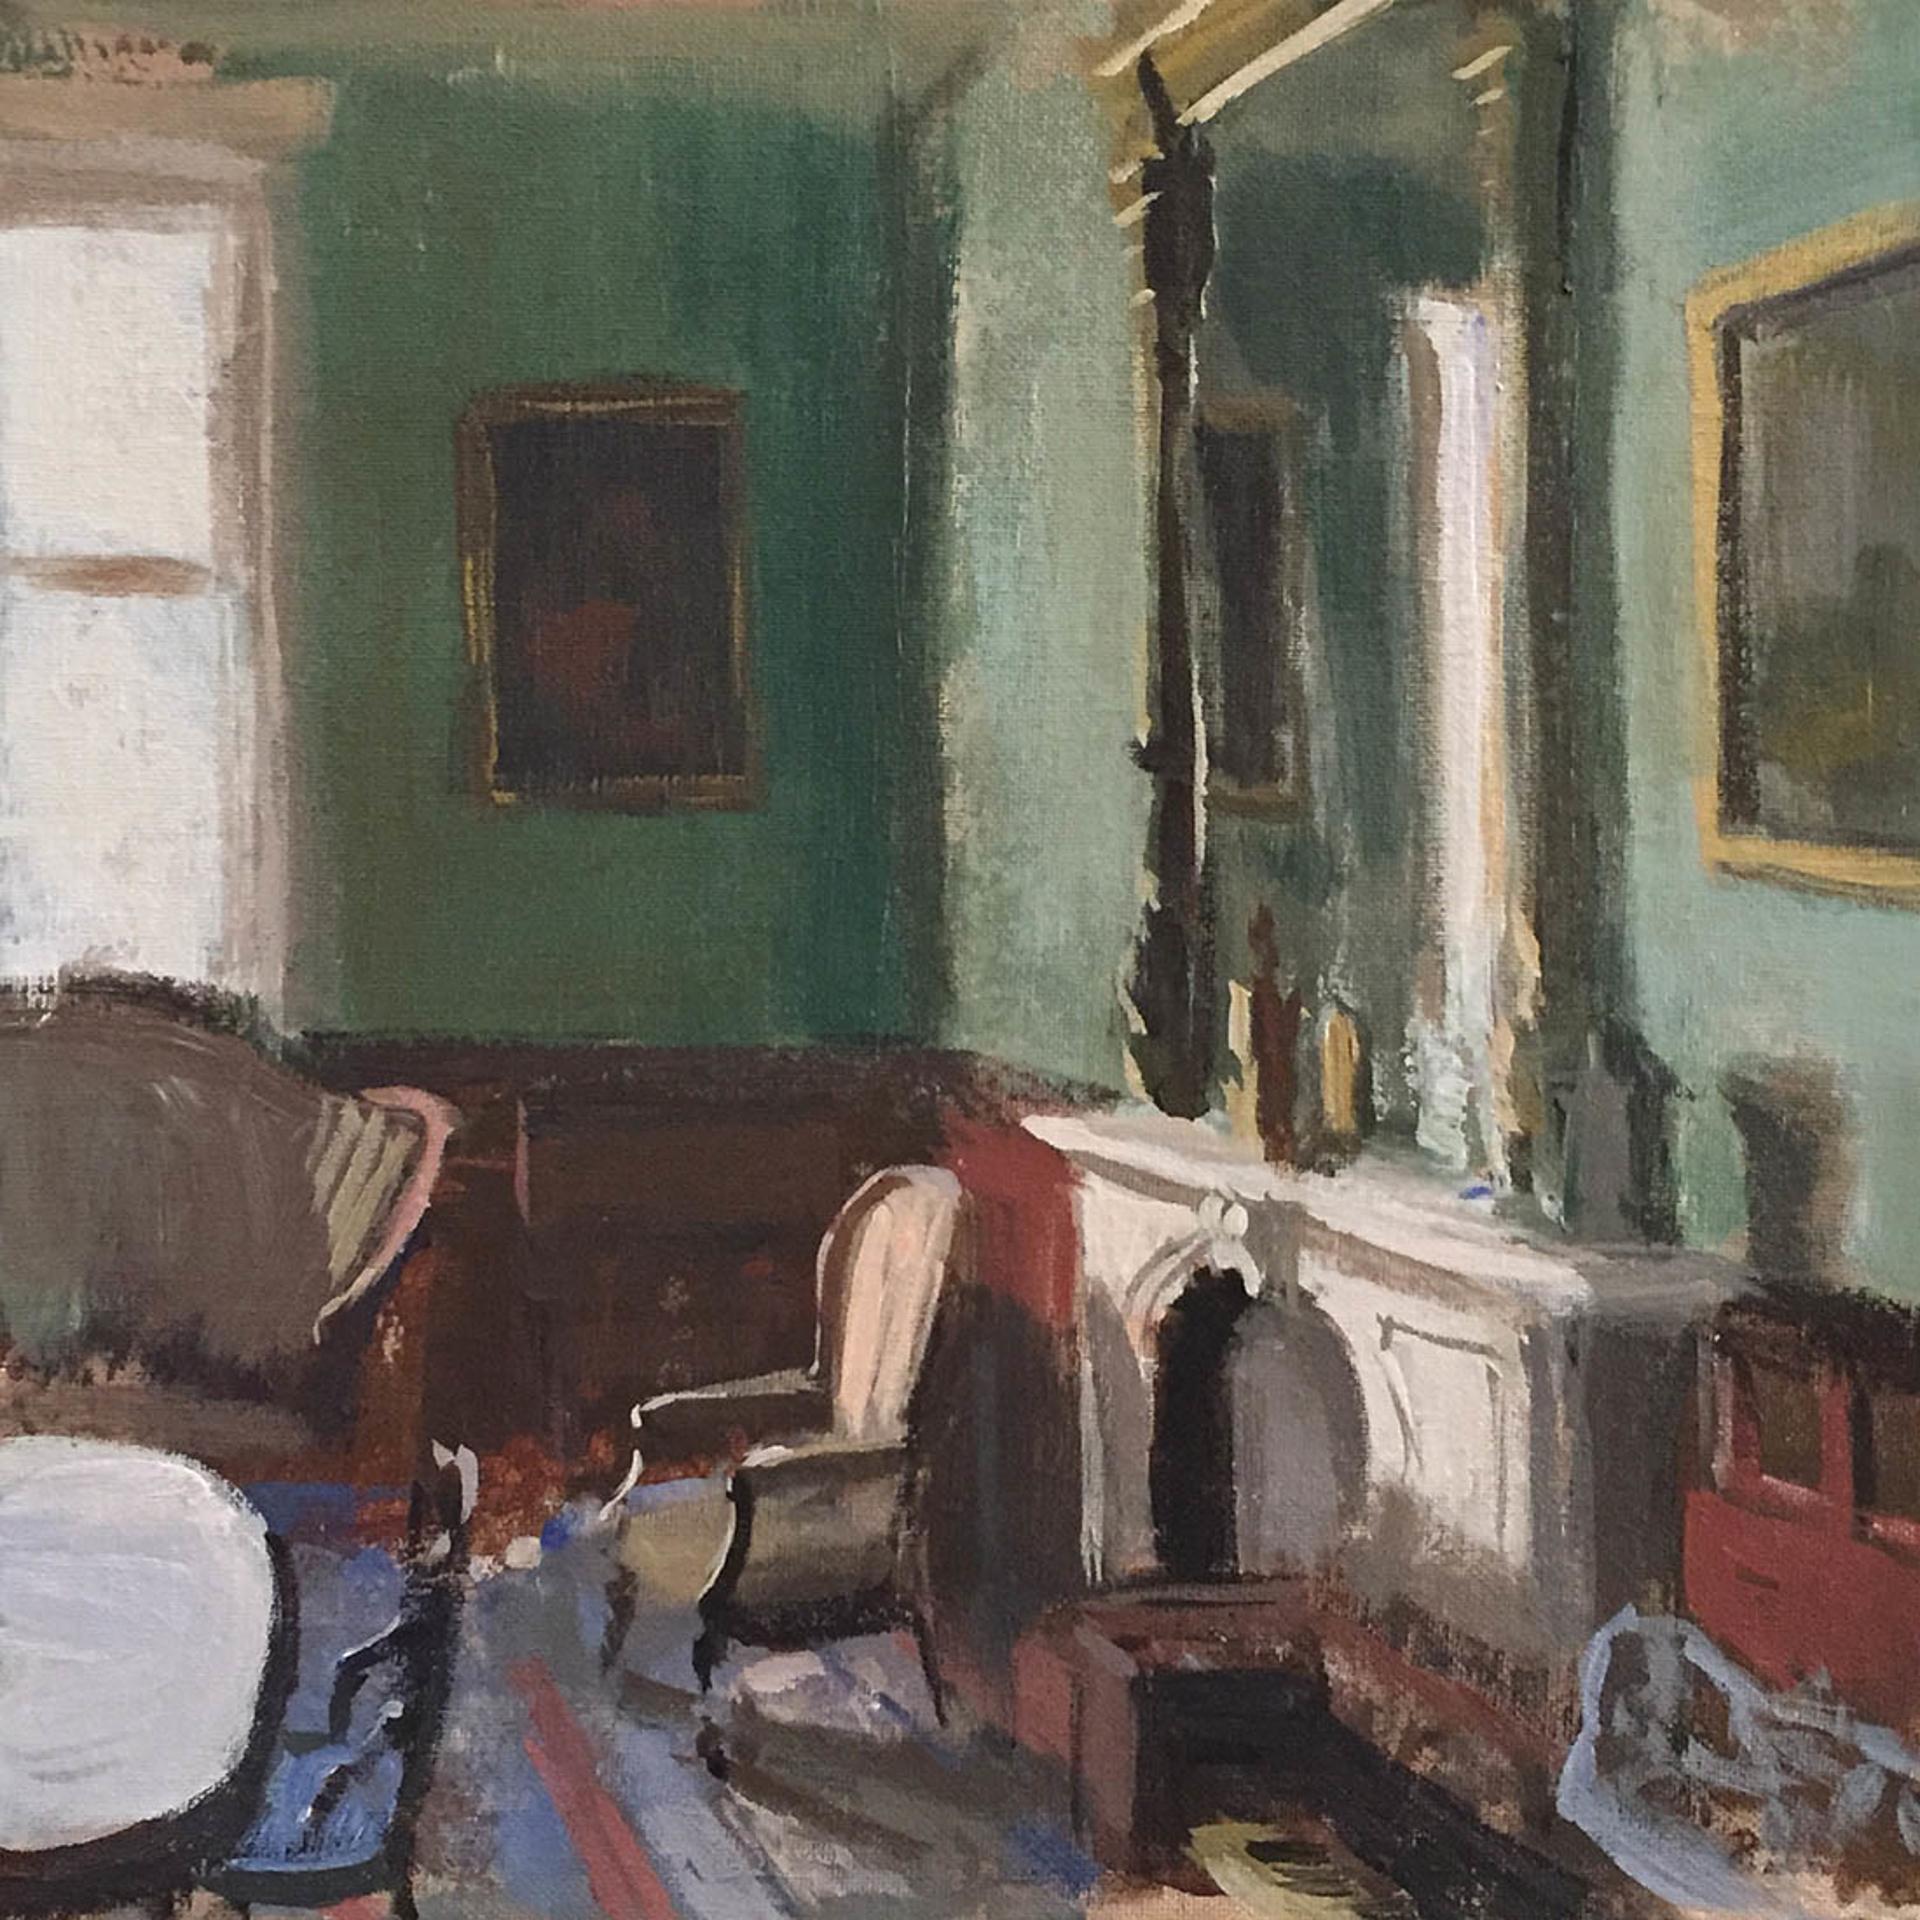 The Green Room by Joe Gyurcsak